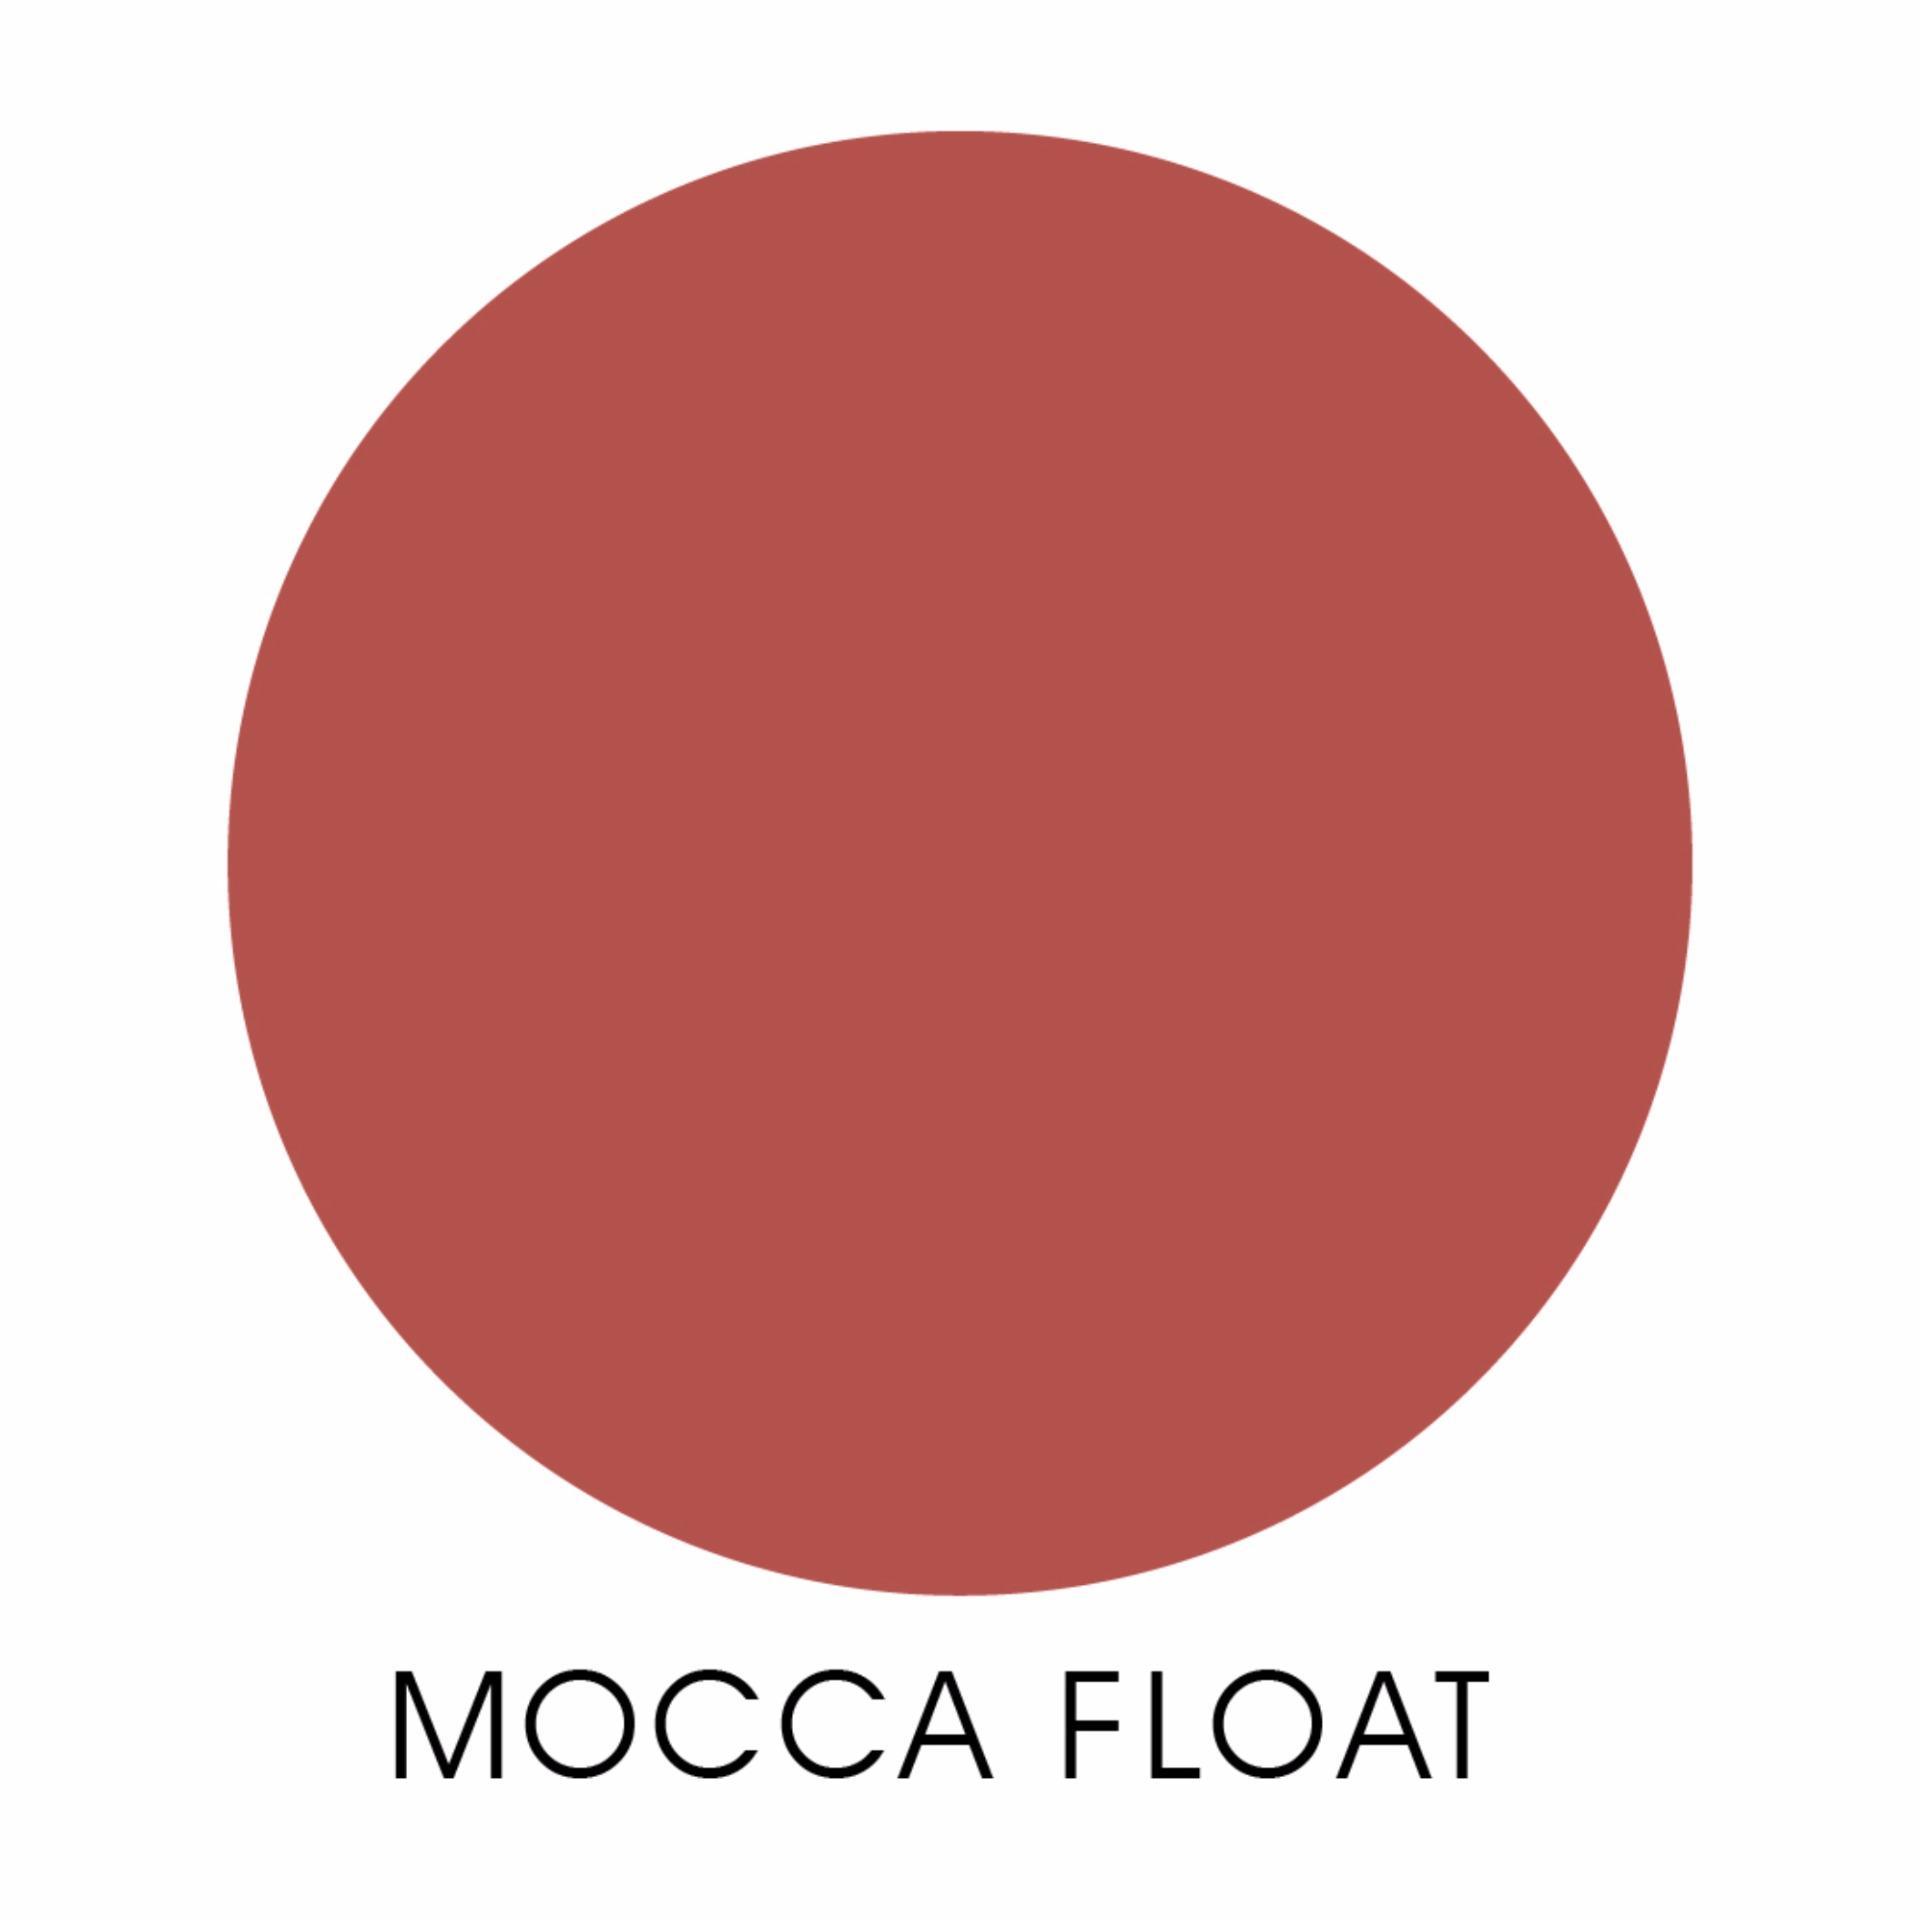 Zoya Cosmetics Ultramoisse Lip Pinacota 18 Daftar Harga Terkini Strawbeery Ice 04 Mocca Float 03